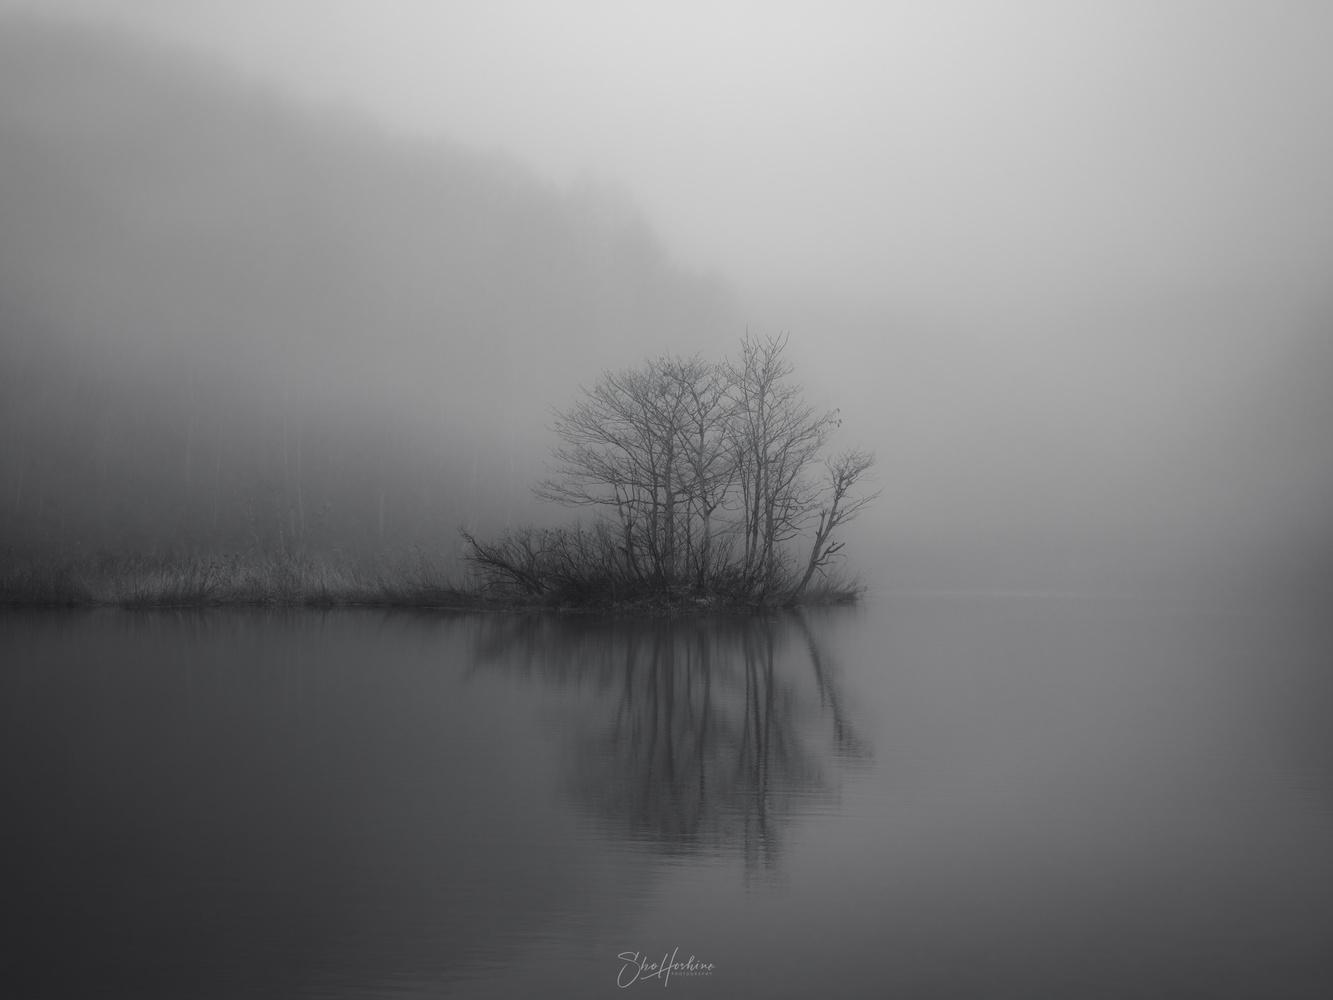 Emerge by Sho Hoshino